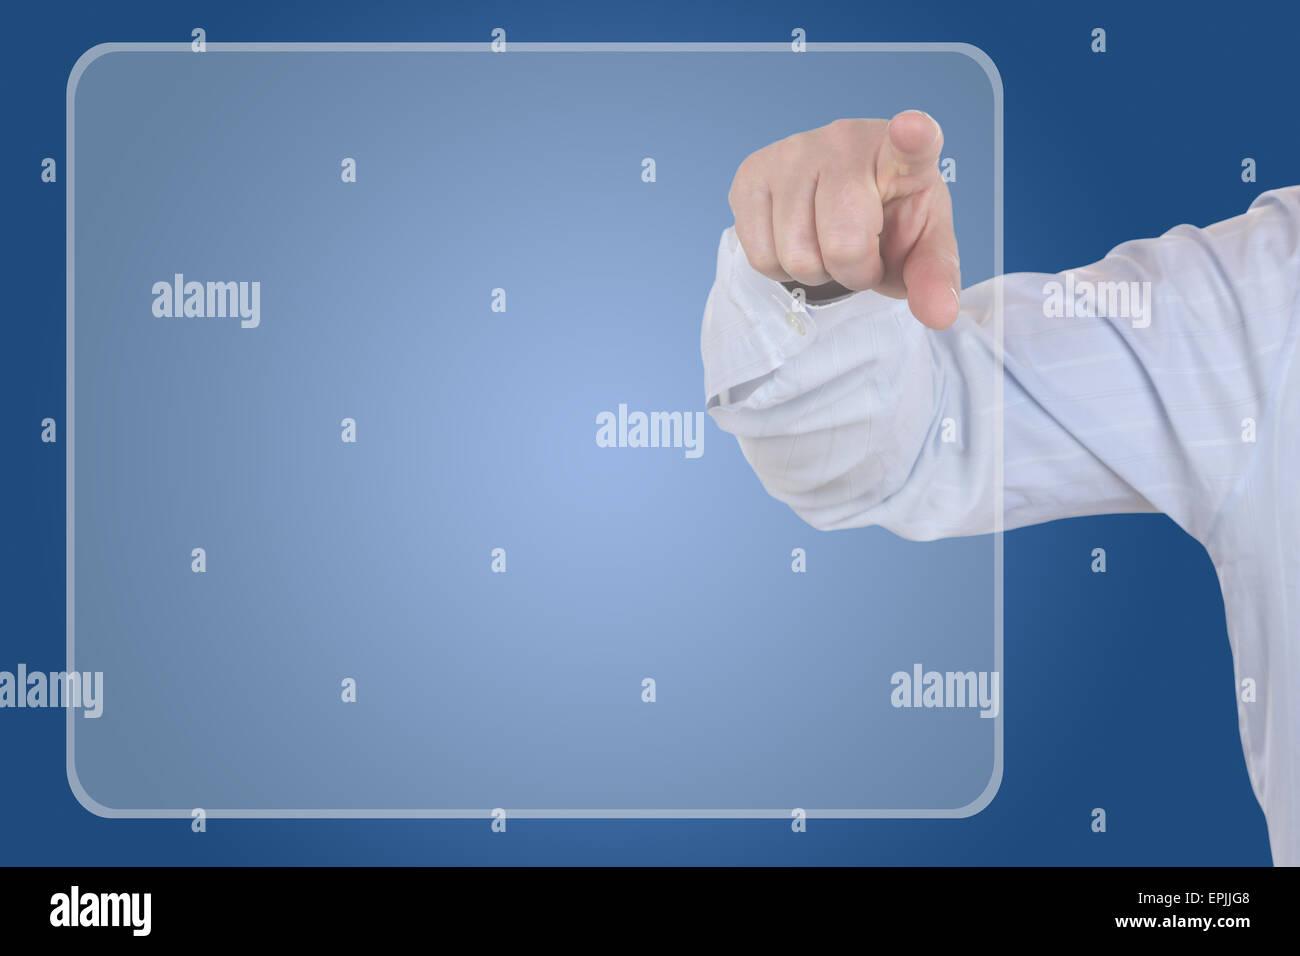 Businessman mit leerem Display Thema Organisation, Business - Stock Image